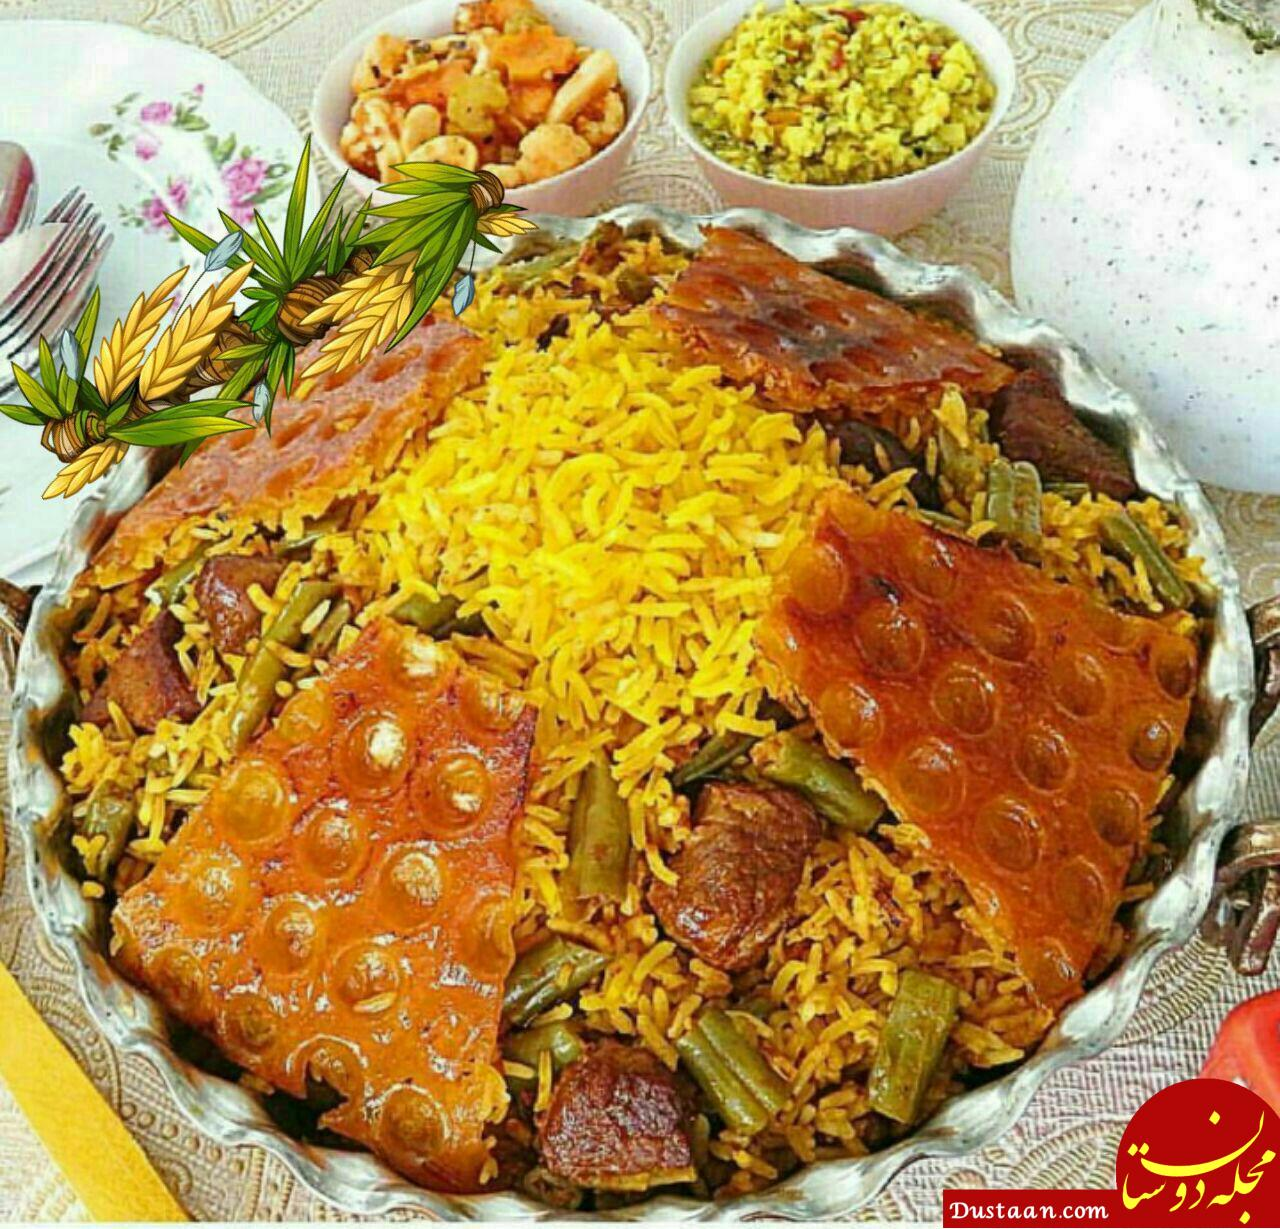 www.dustaan.com طرز تهیه لوبیا پلو به سبکی خوشمزه و متفاوت